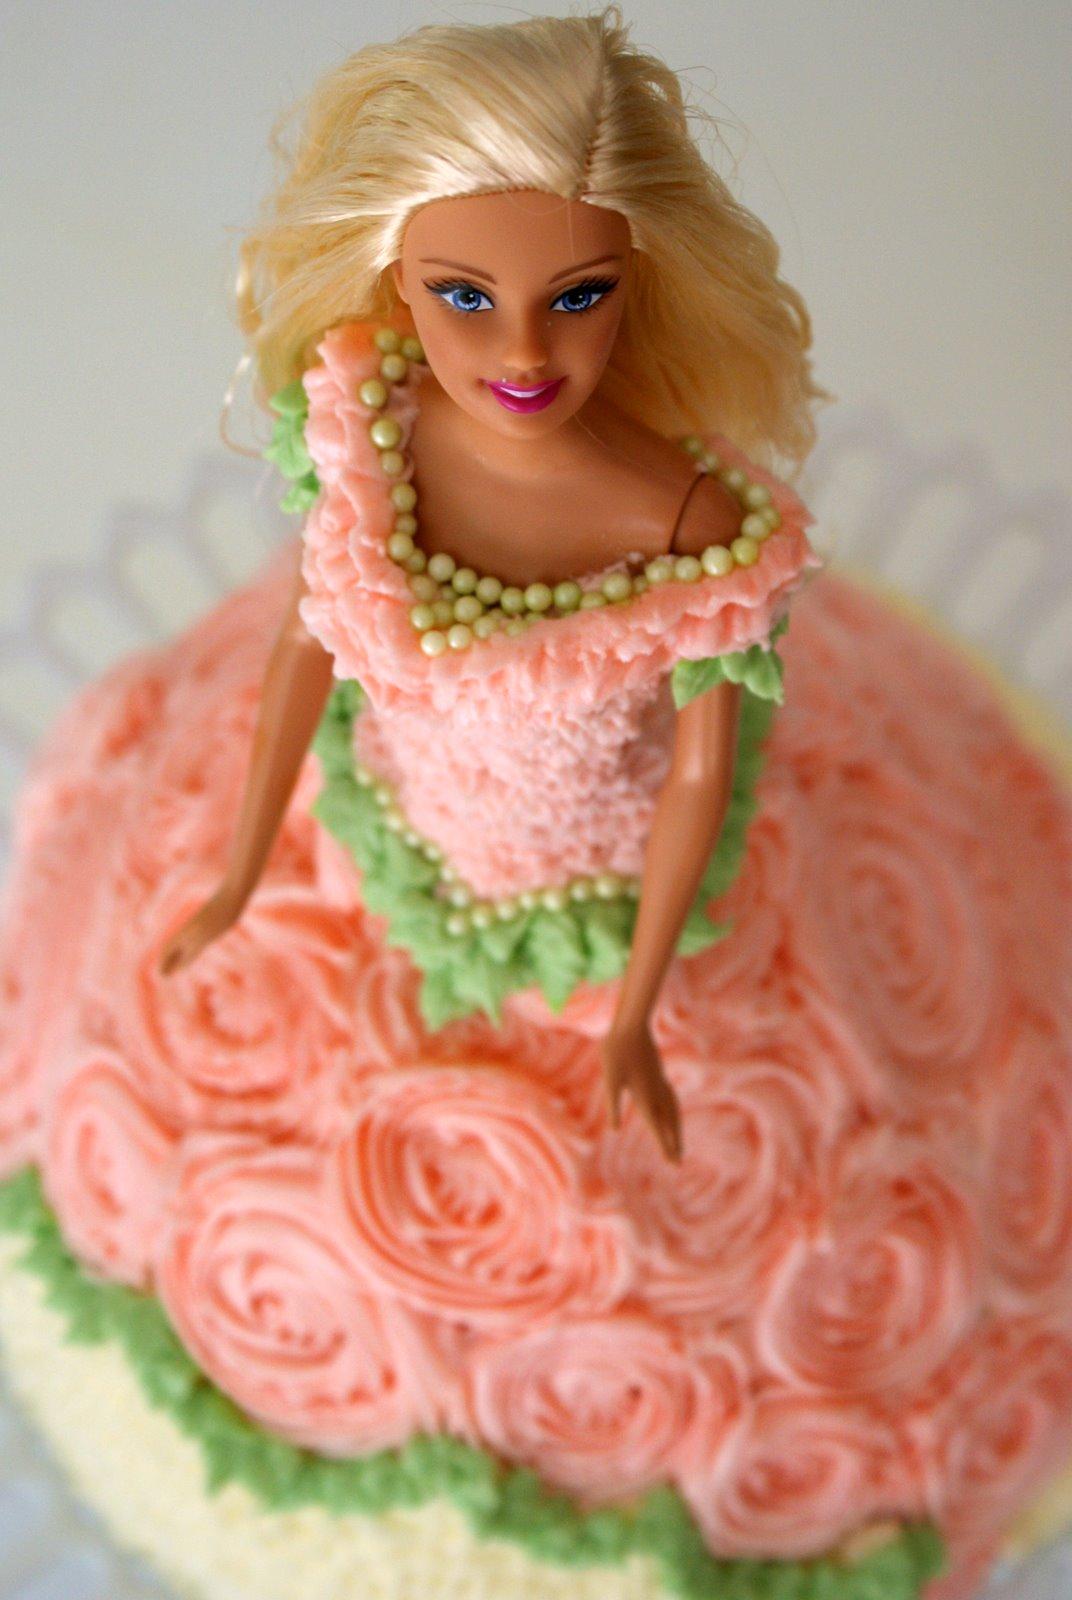 A Little Loveliness Barbie Doll Cake